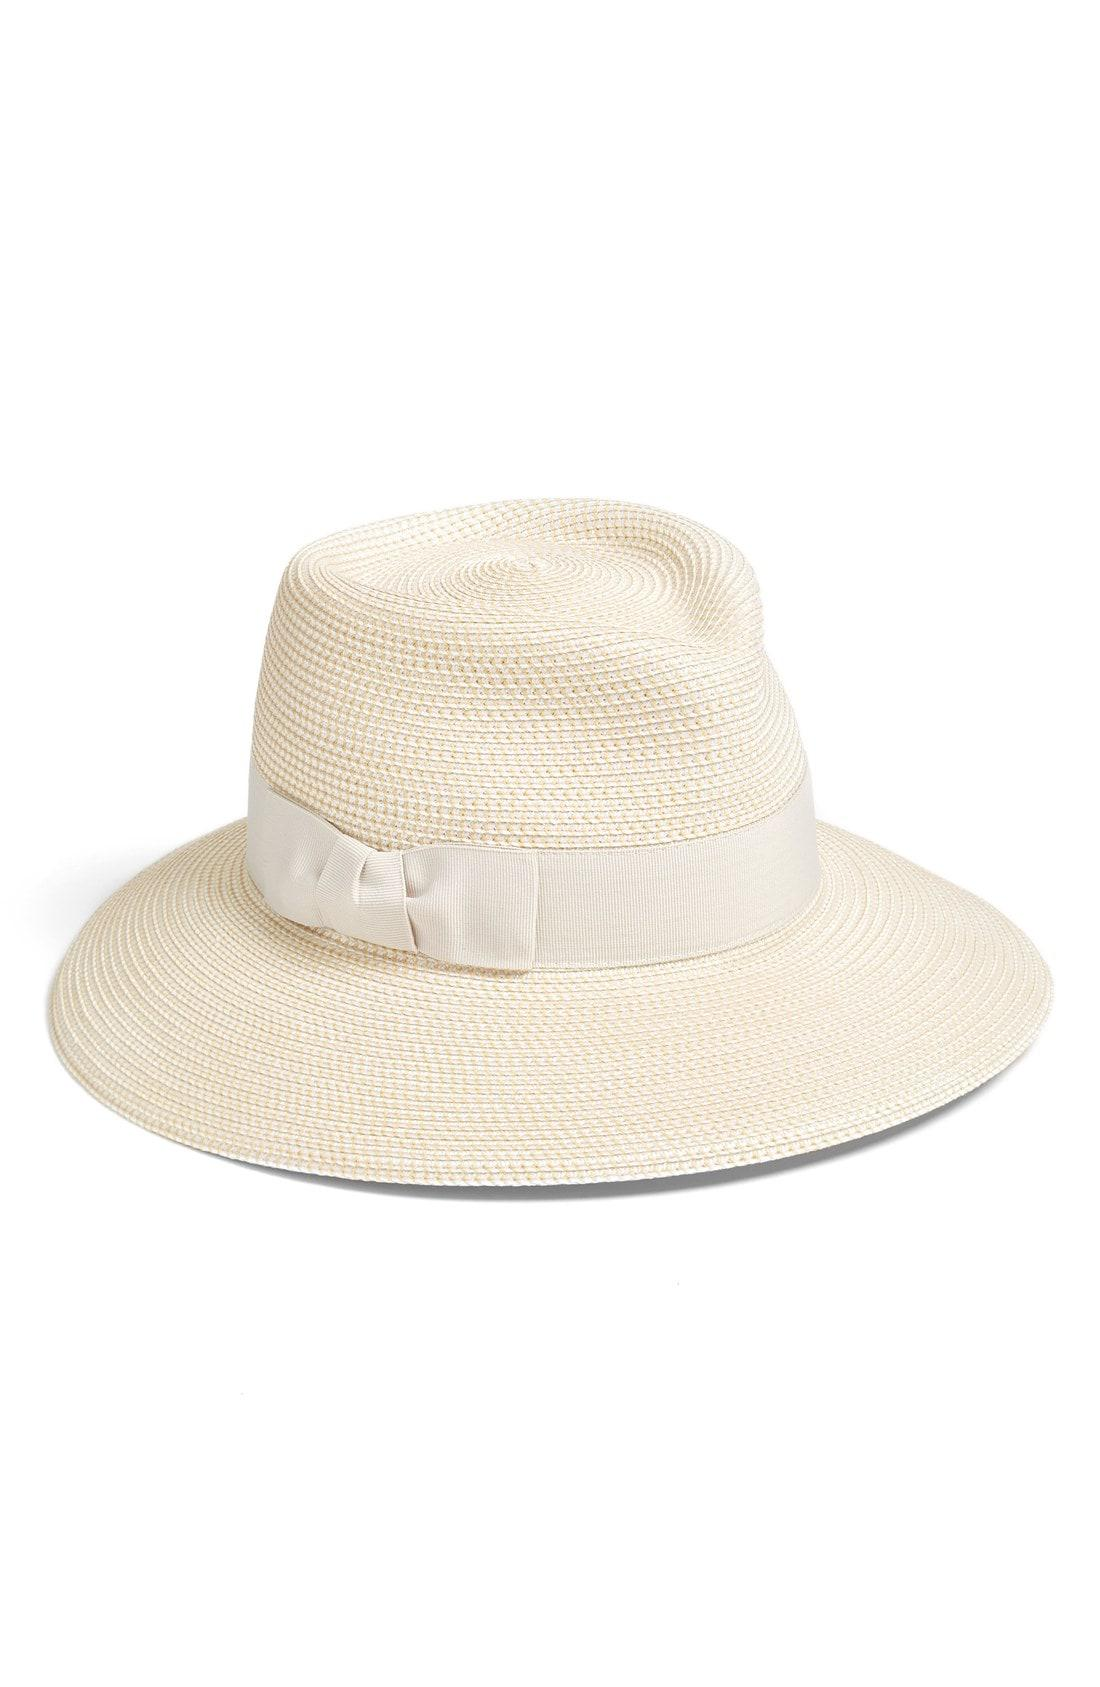 Lyst - Eric Javits  phoenix  Packable Fedora Sun Hat in Brown 917ef42f86c